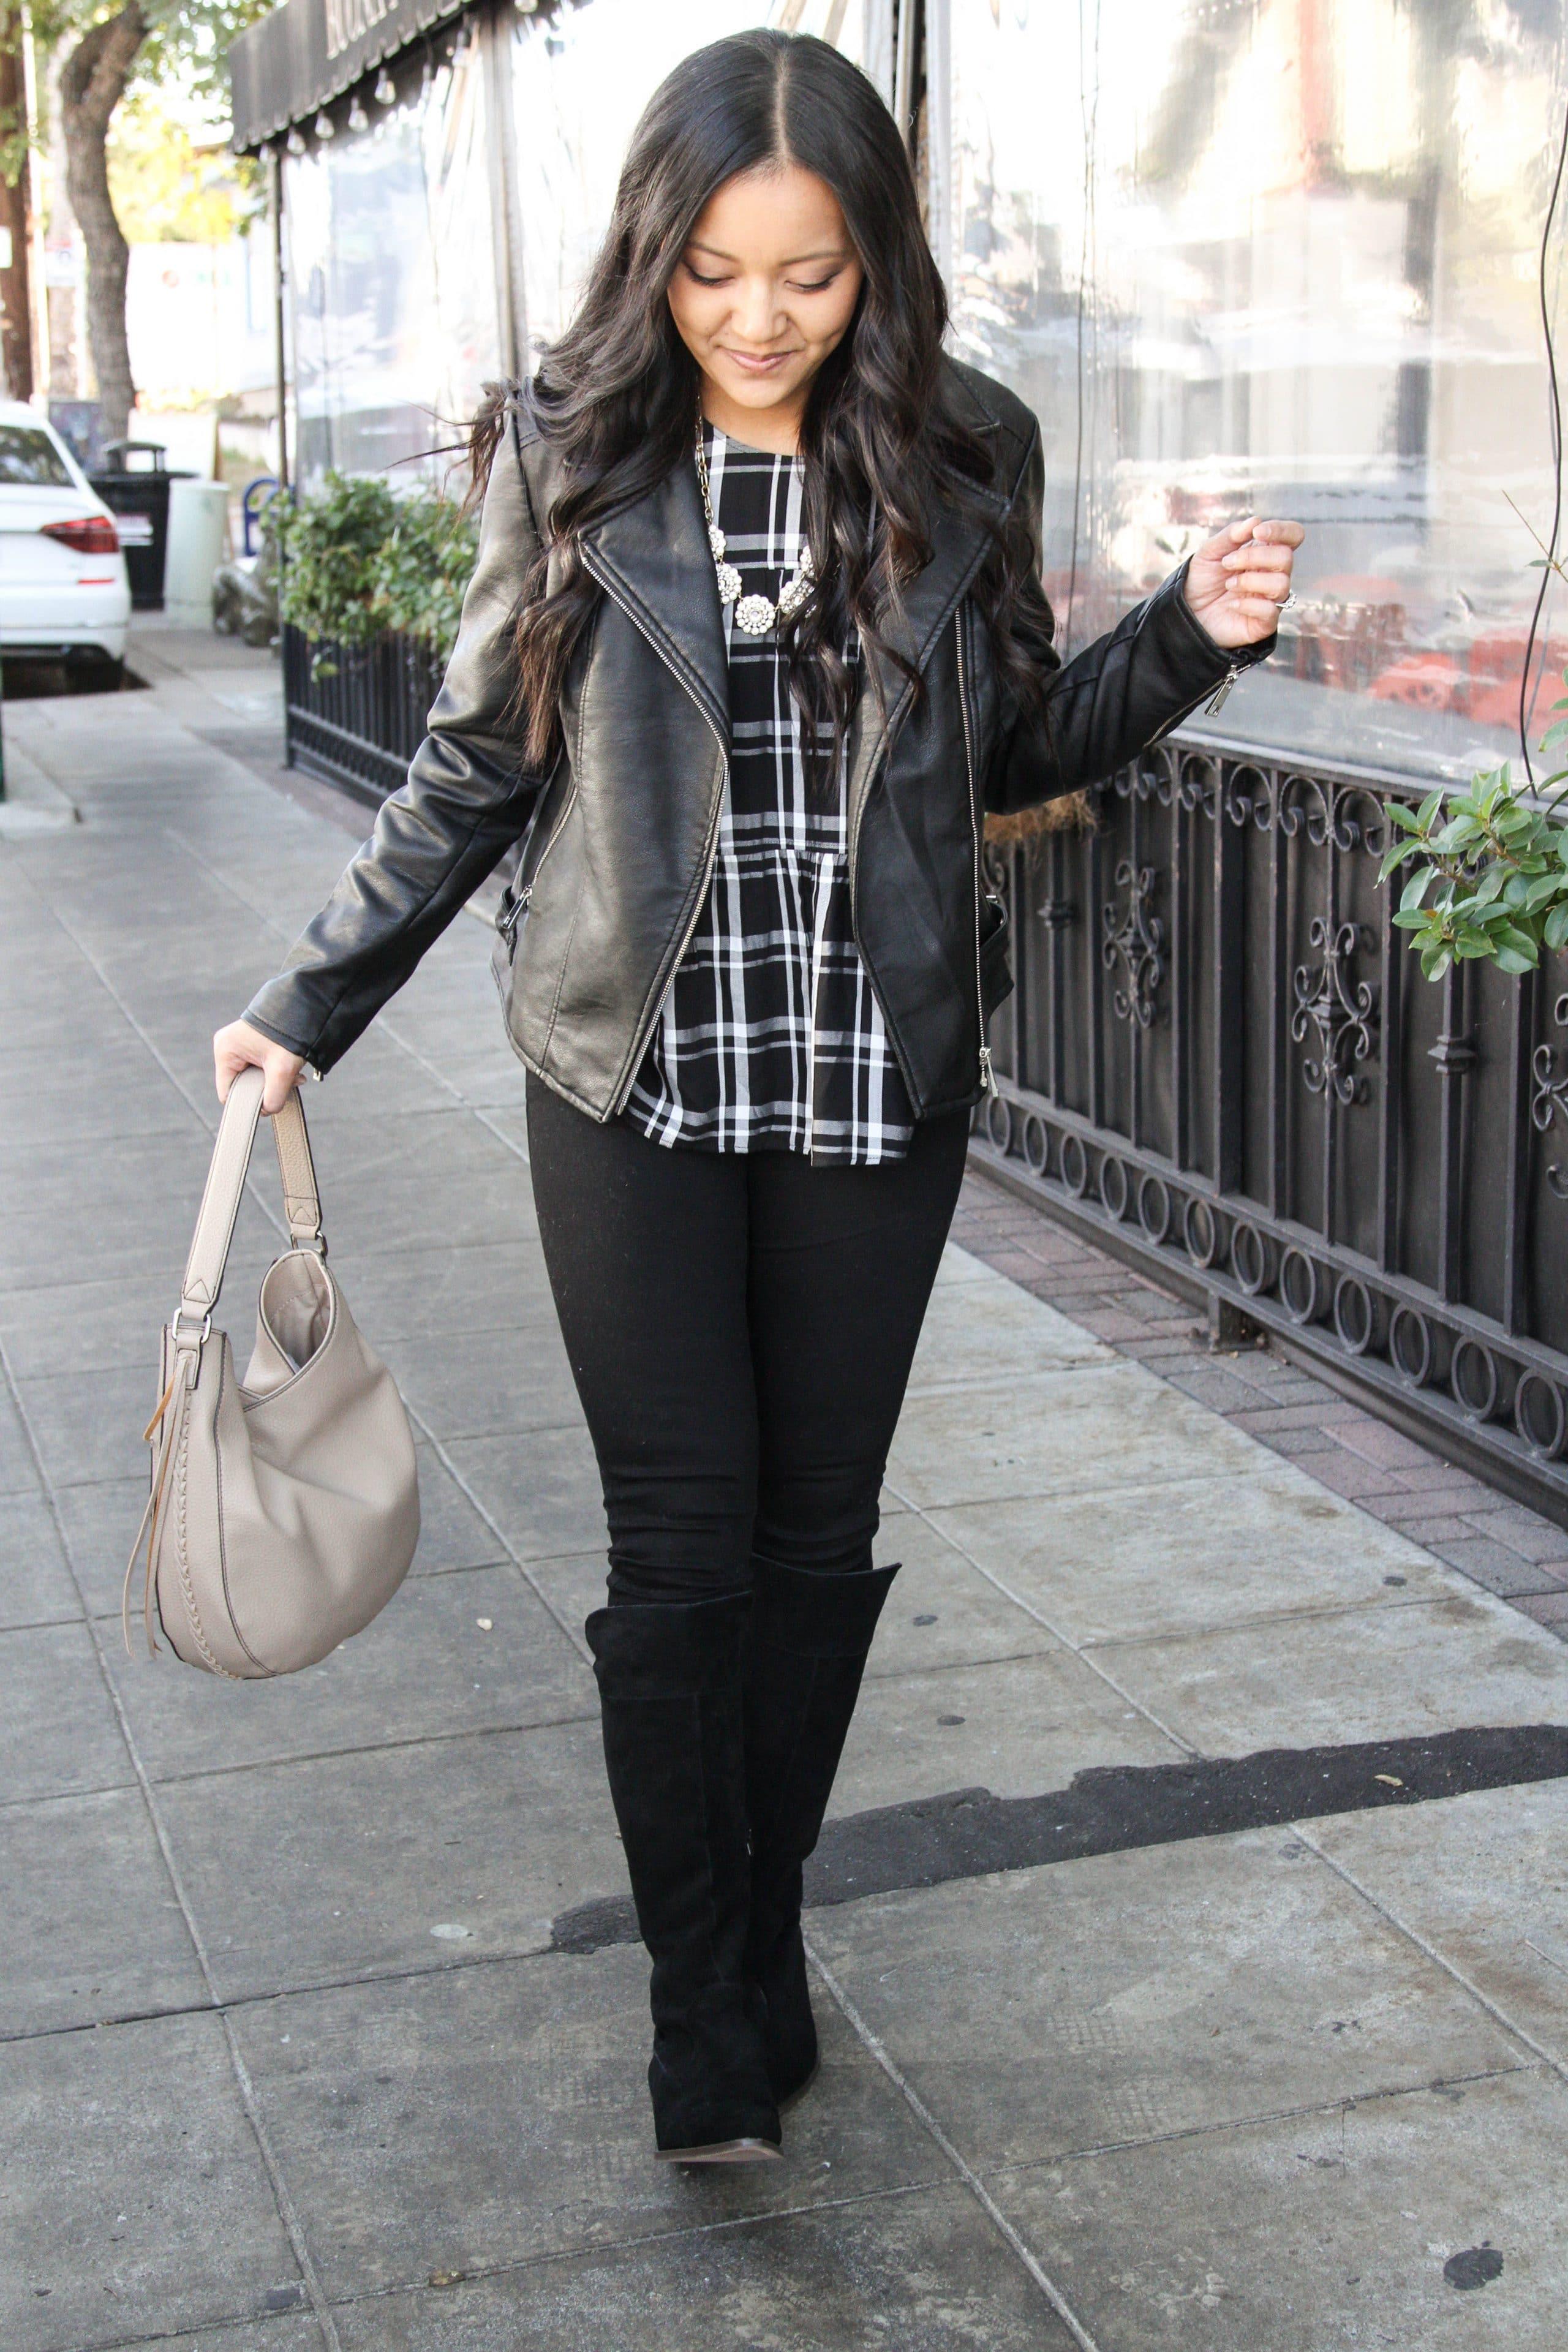 Black boots + tan bag + statement necklace + moto jacket